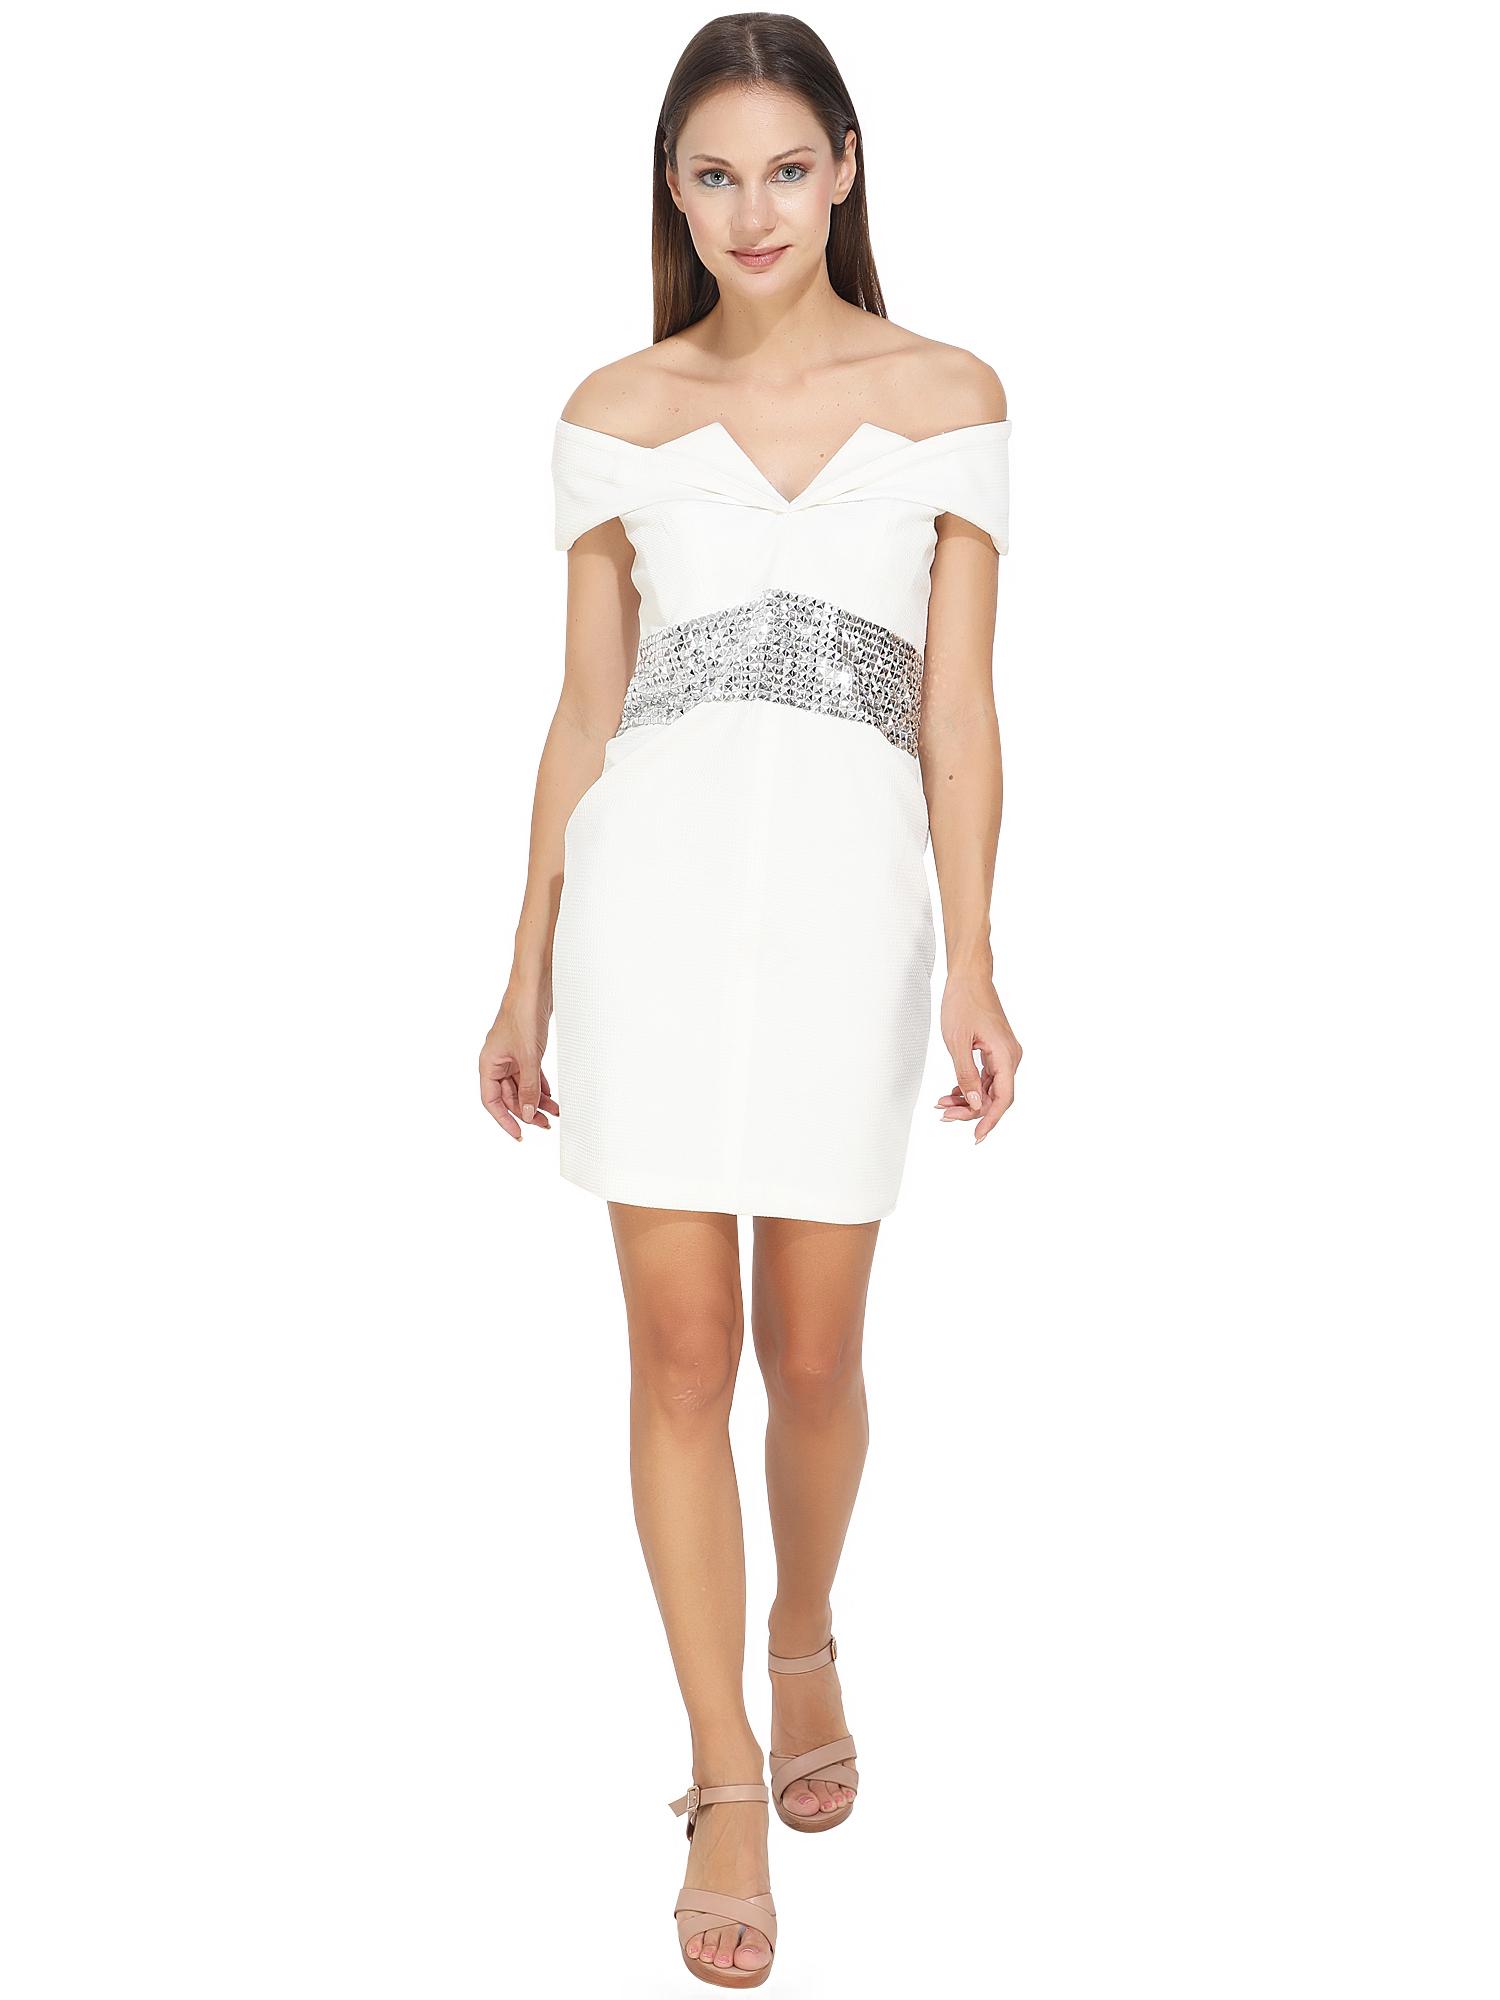 SelF Embossed White Lycra Dress